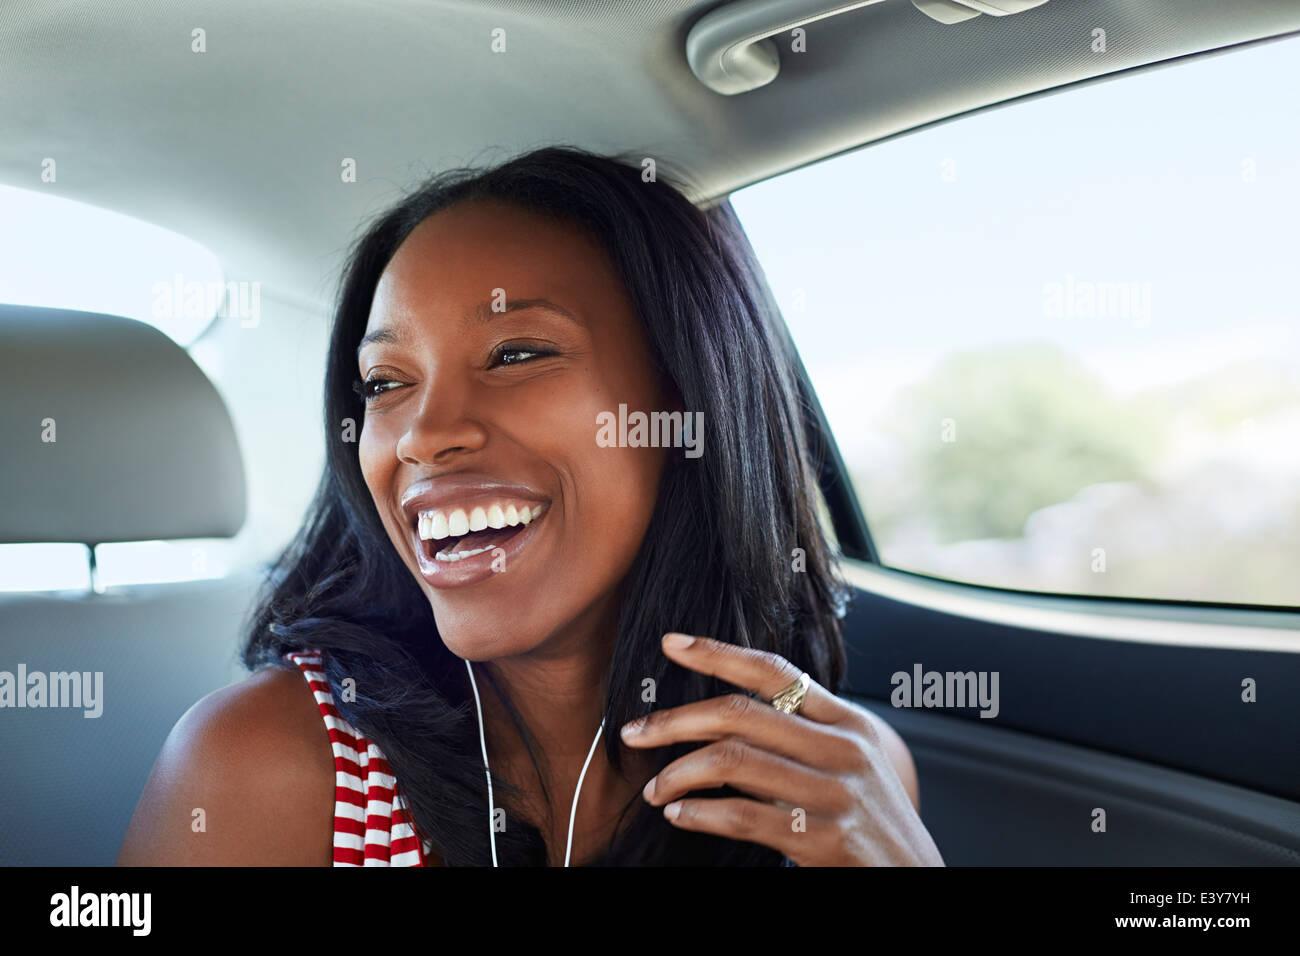 Backseat facial